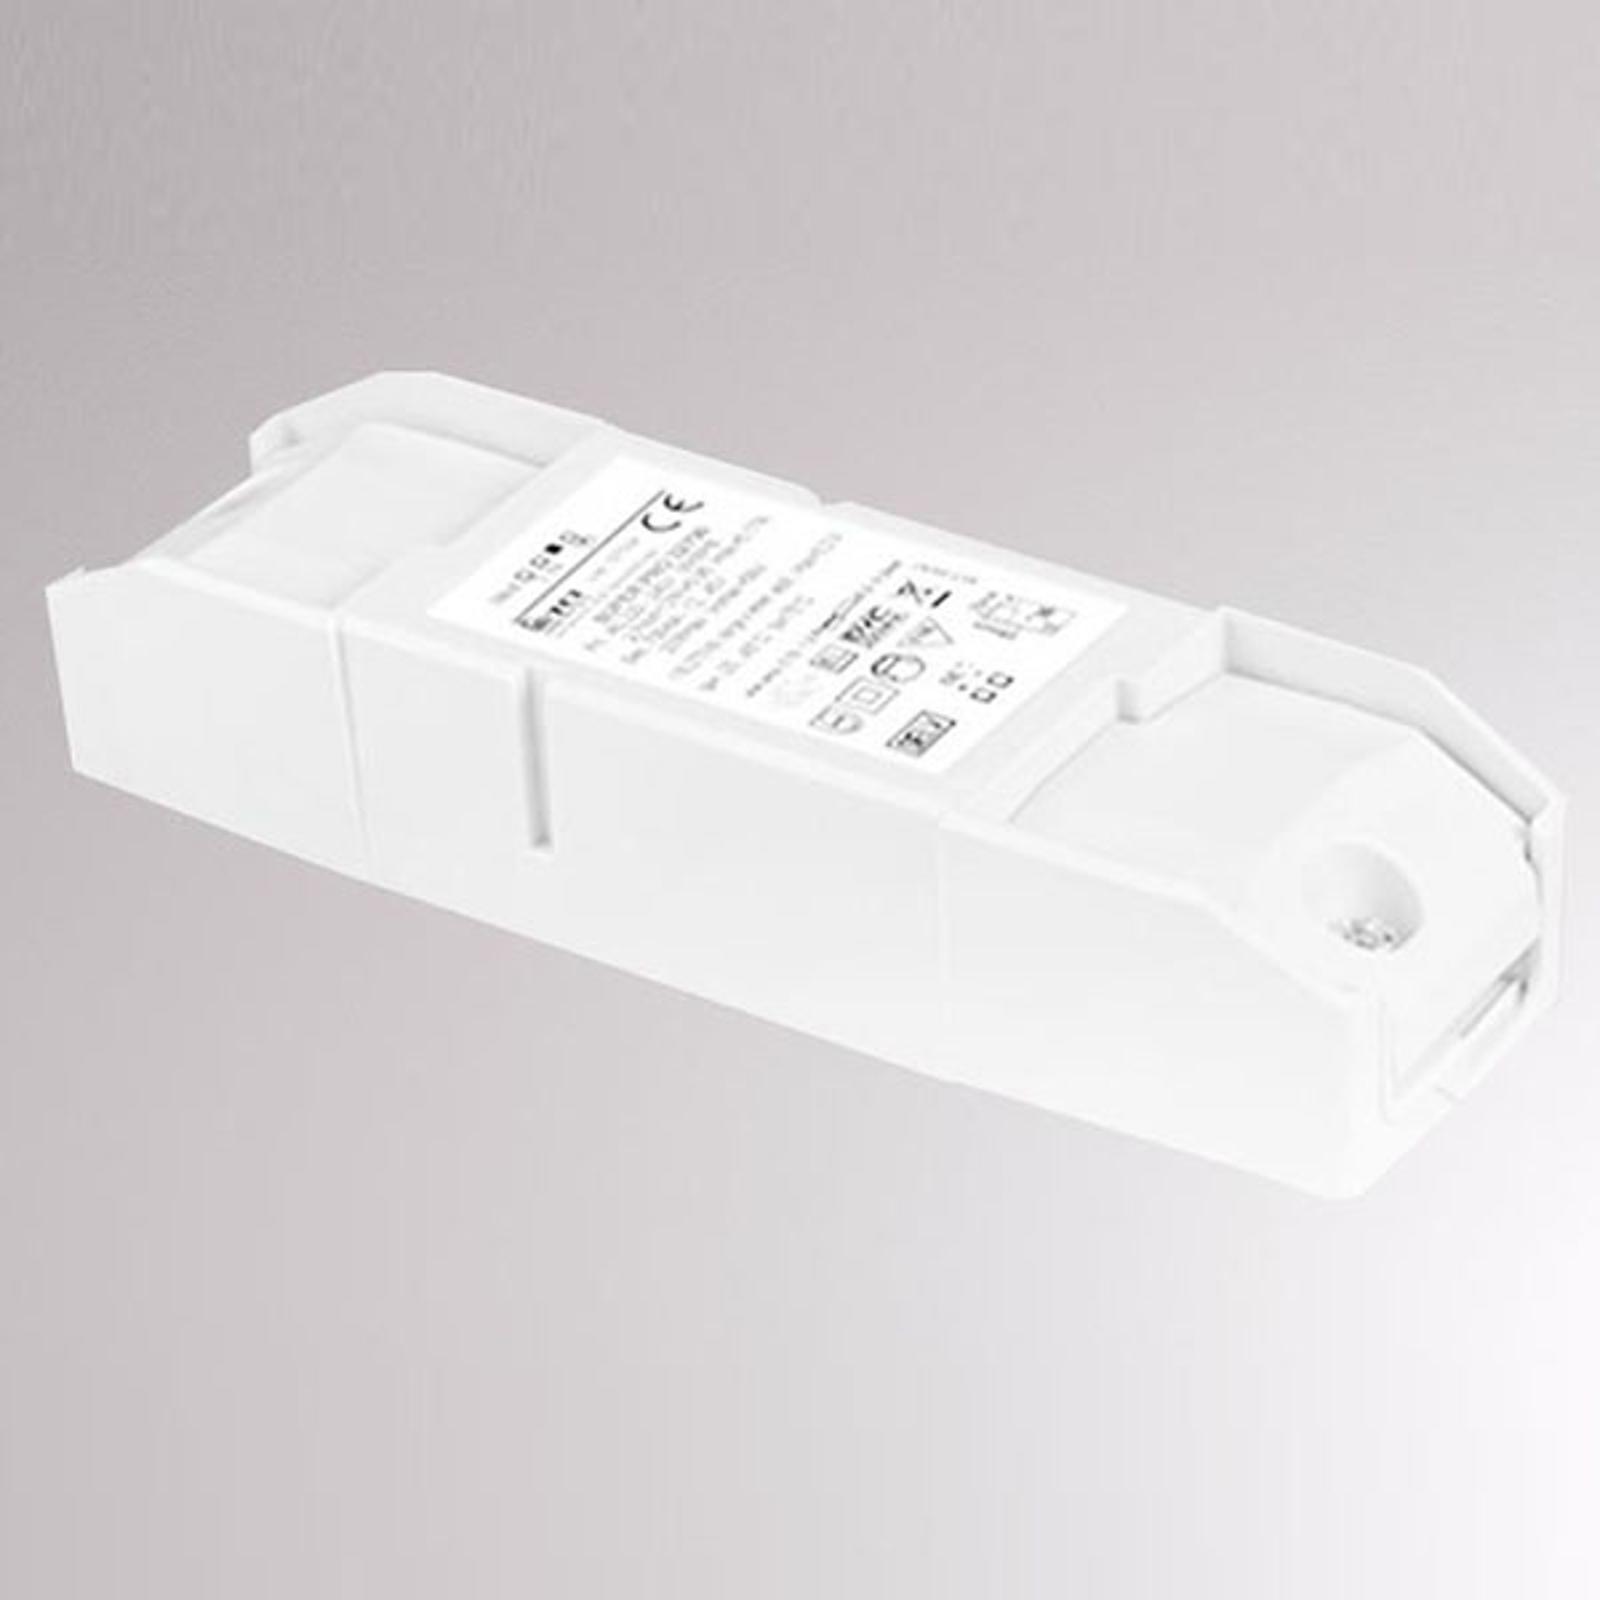 LOUM converter Super Pro23/500 per Liro